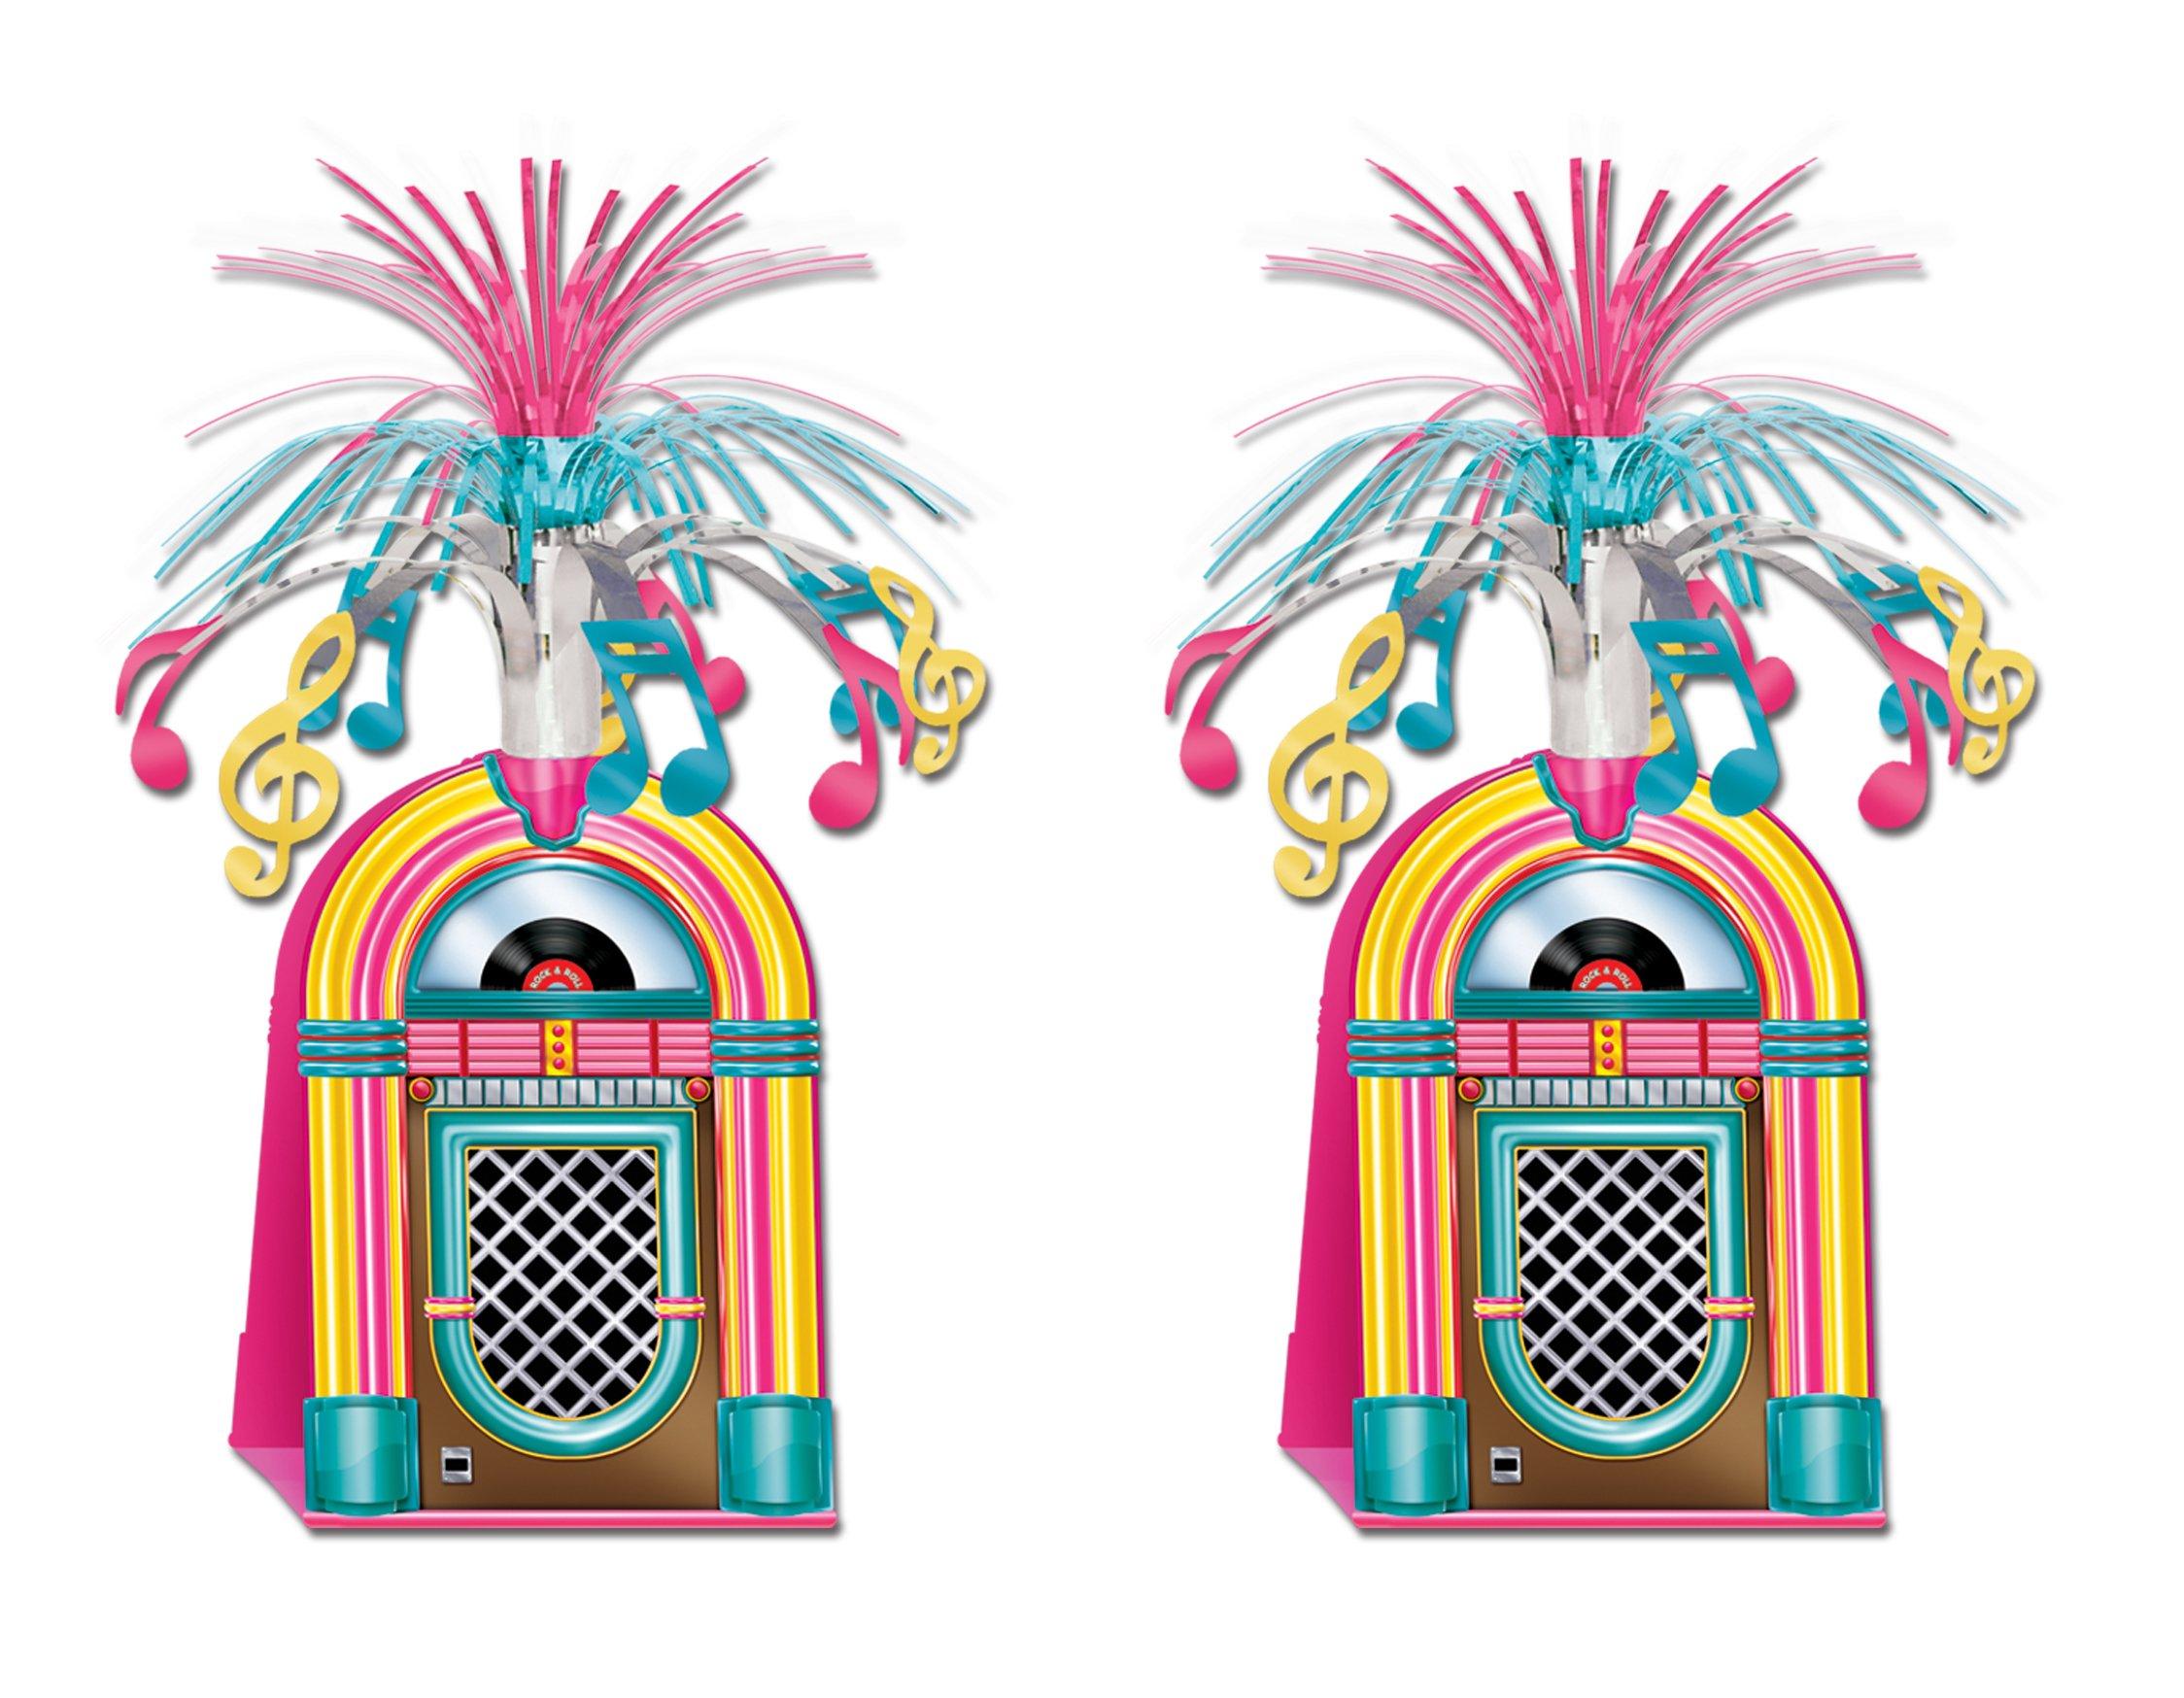 Beistle S57765AZ2, 2 Piece Jukebox Centerpieces, 15''